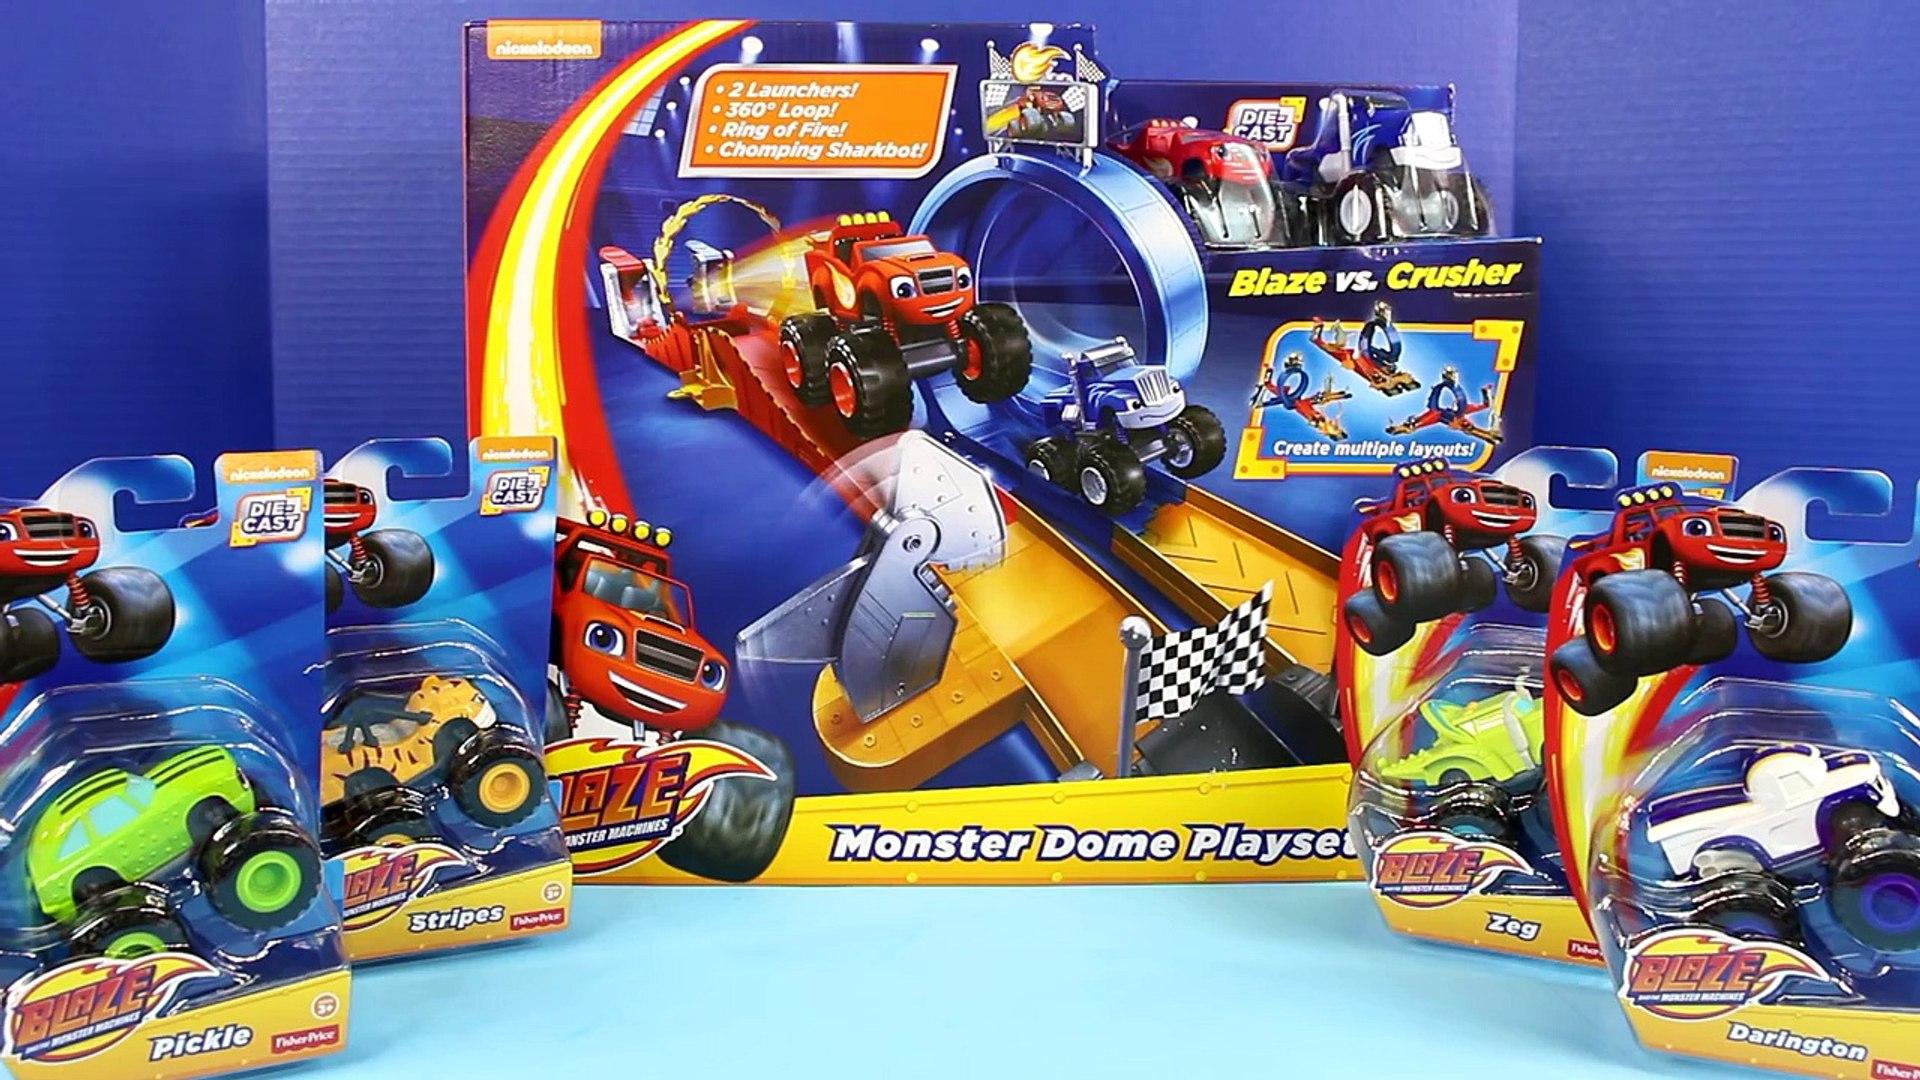 Nickelodeon Blaze And The Monster Machines Monster Dome Playset Darington Stripes Crusher Zeg